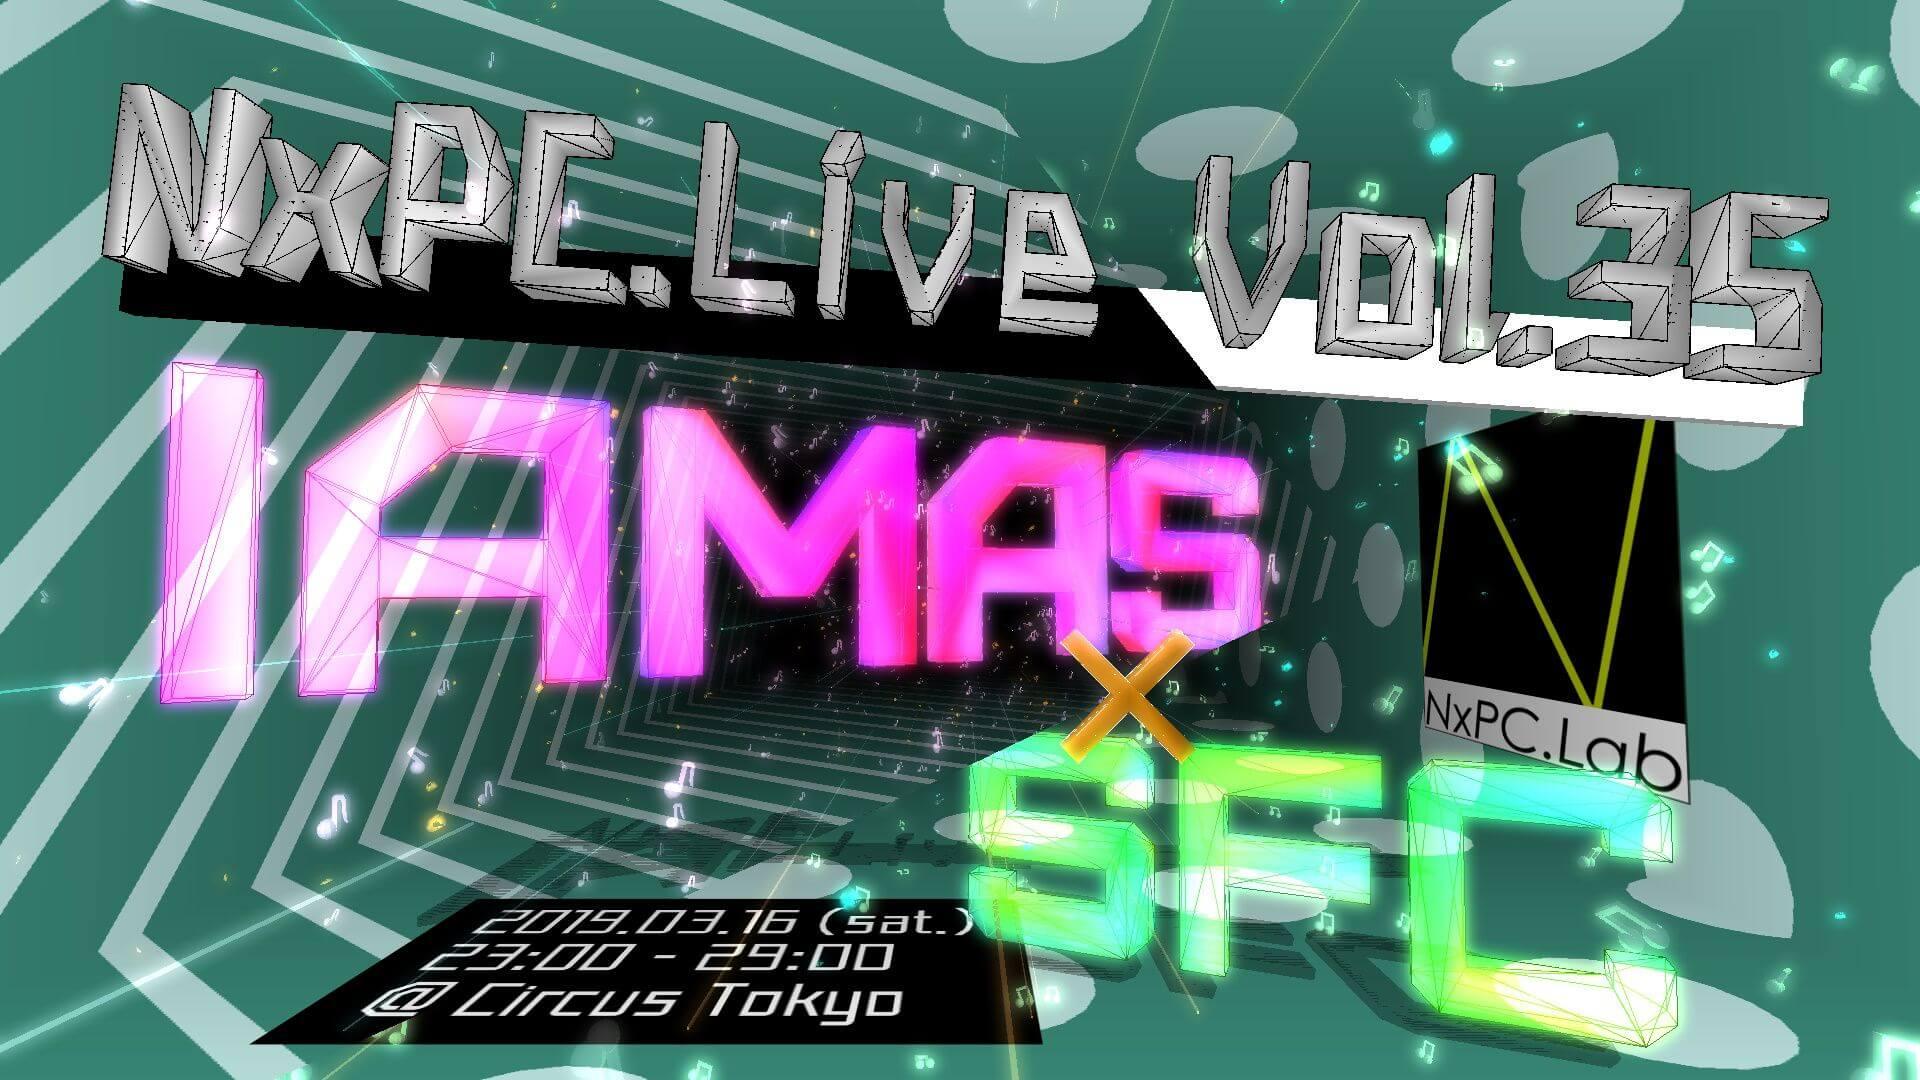 NxPC.Live vol.35 IAMAS x SFC